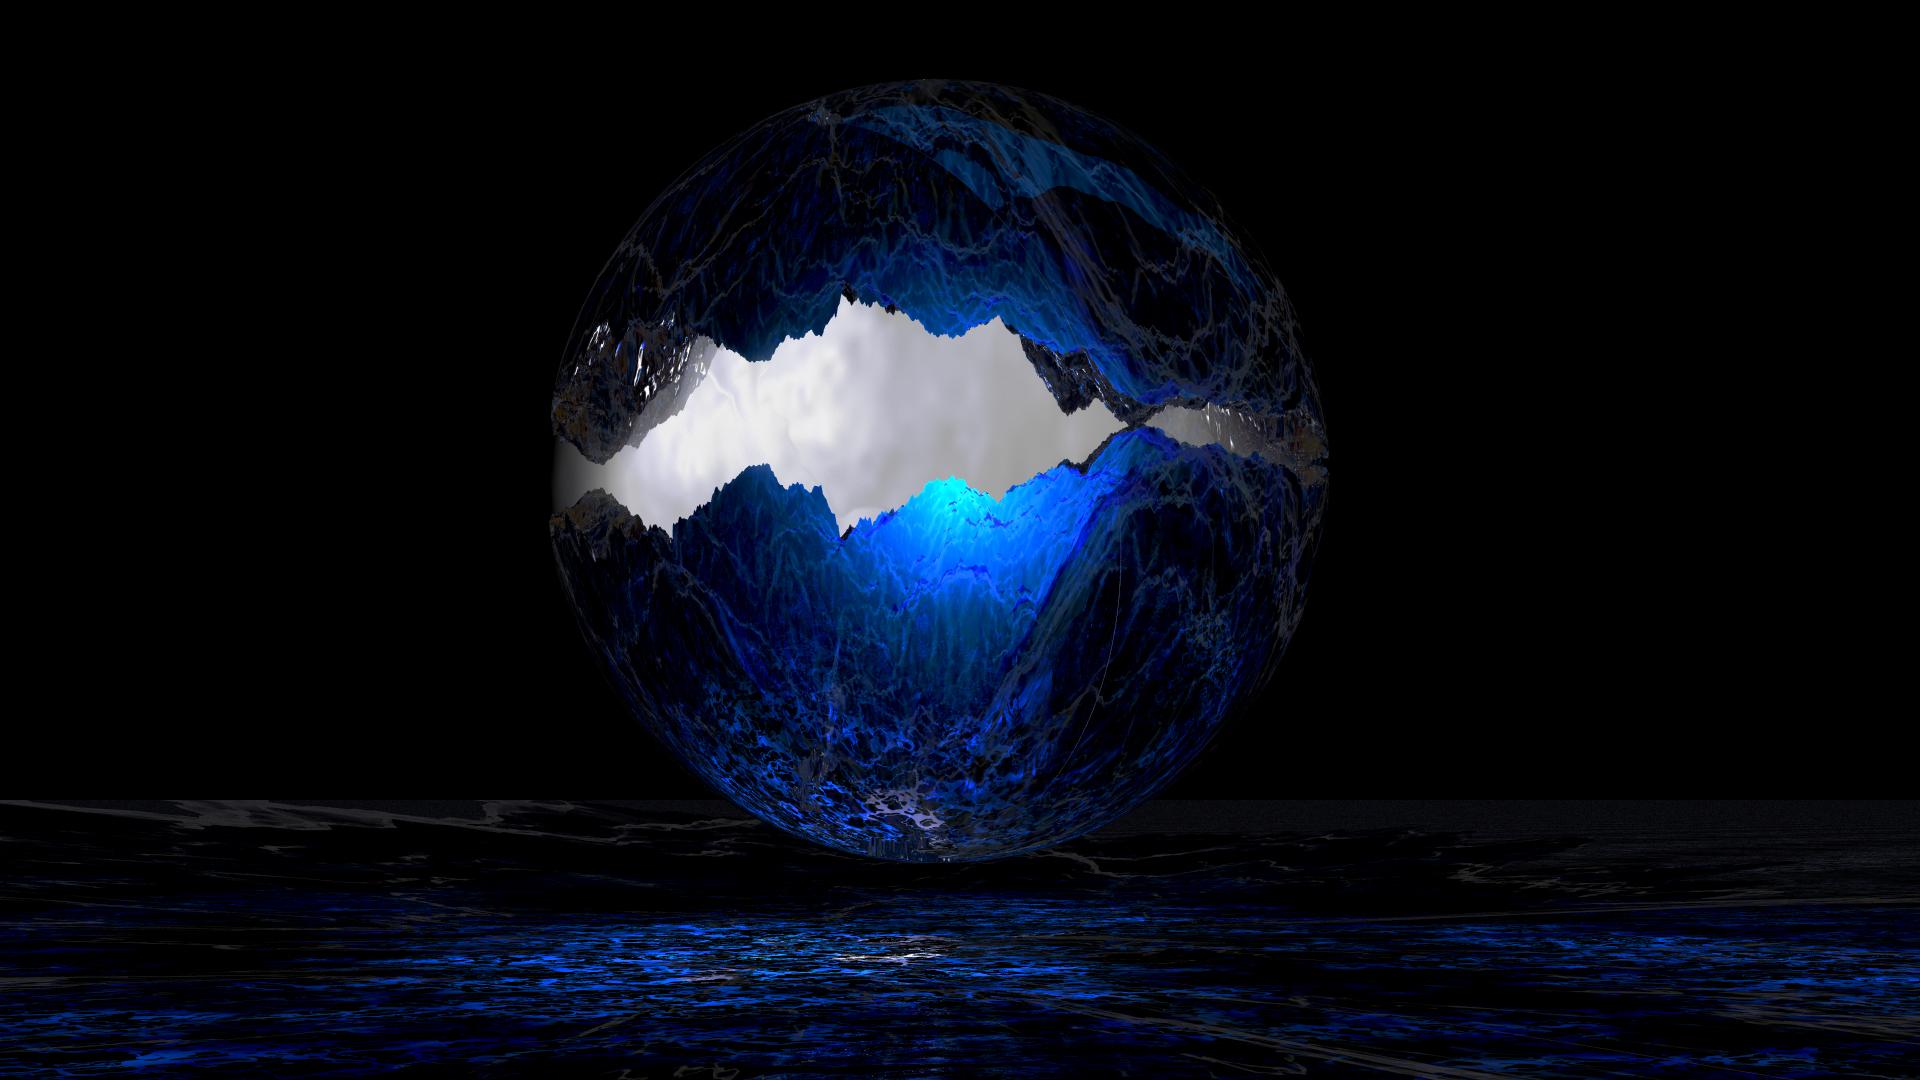 Blue Dark Light Sphere 1920x1080